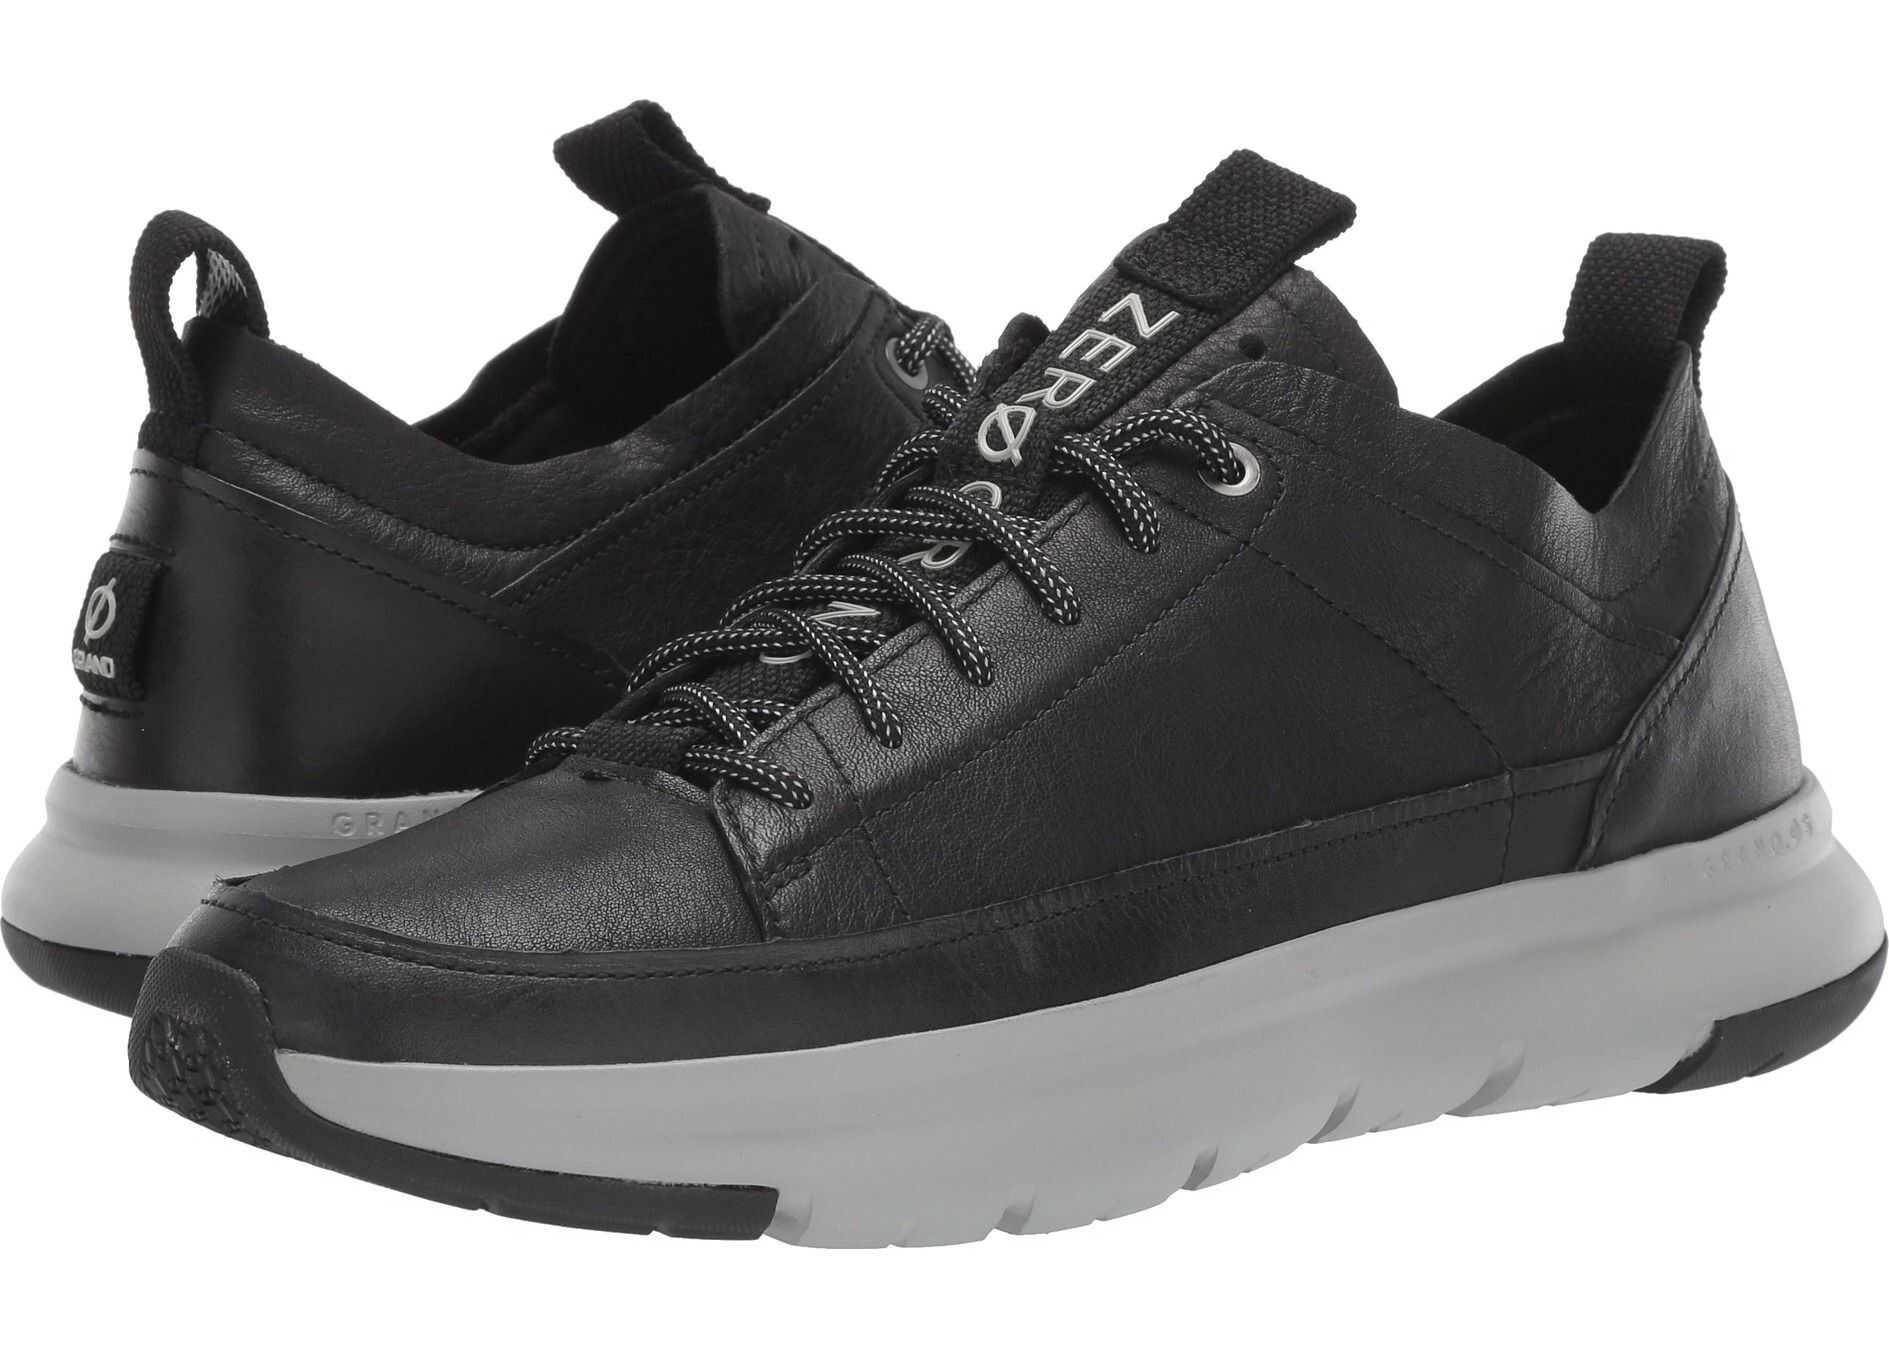 Cole Haan Zerogrand Explore Sneaker Black/Limestone